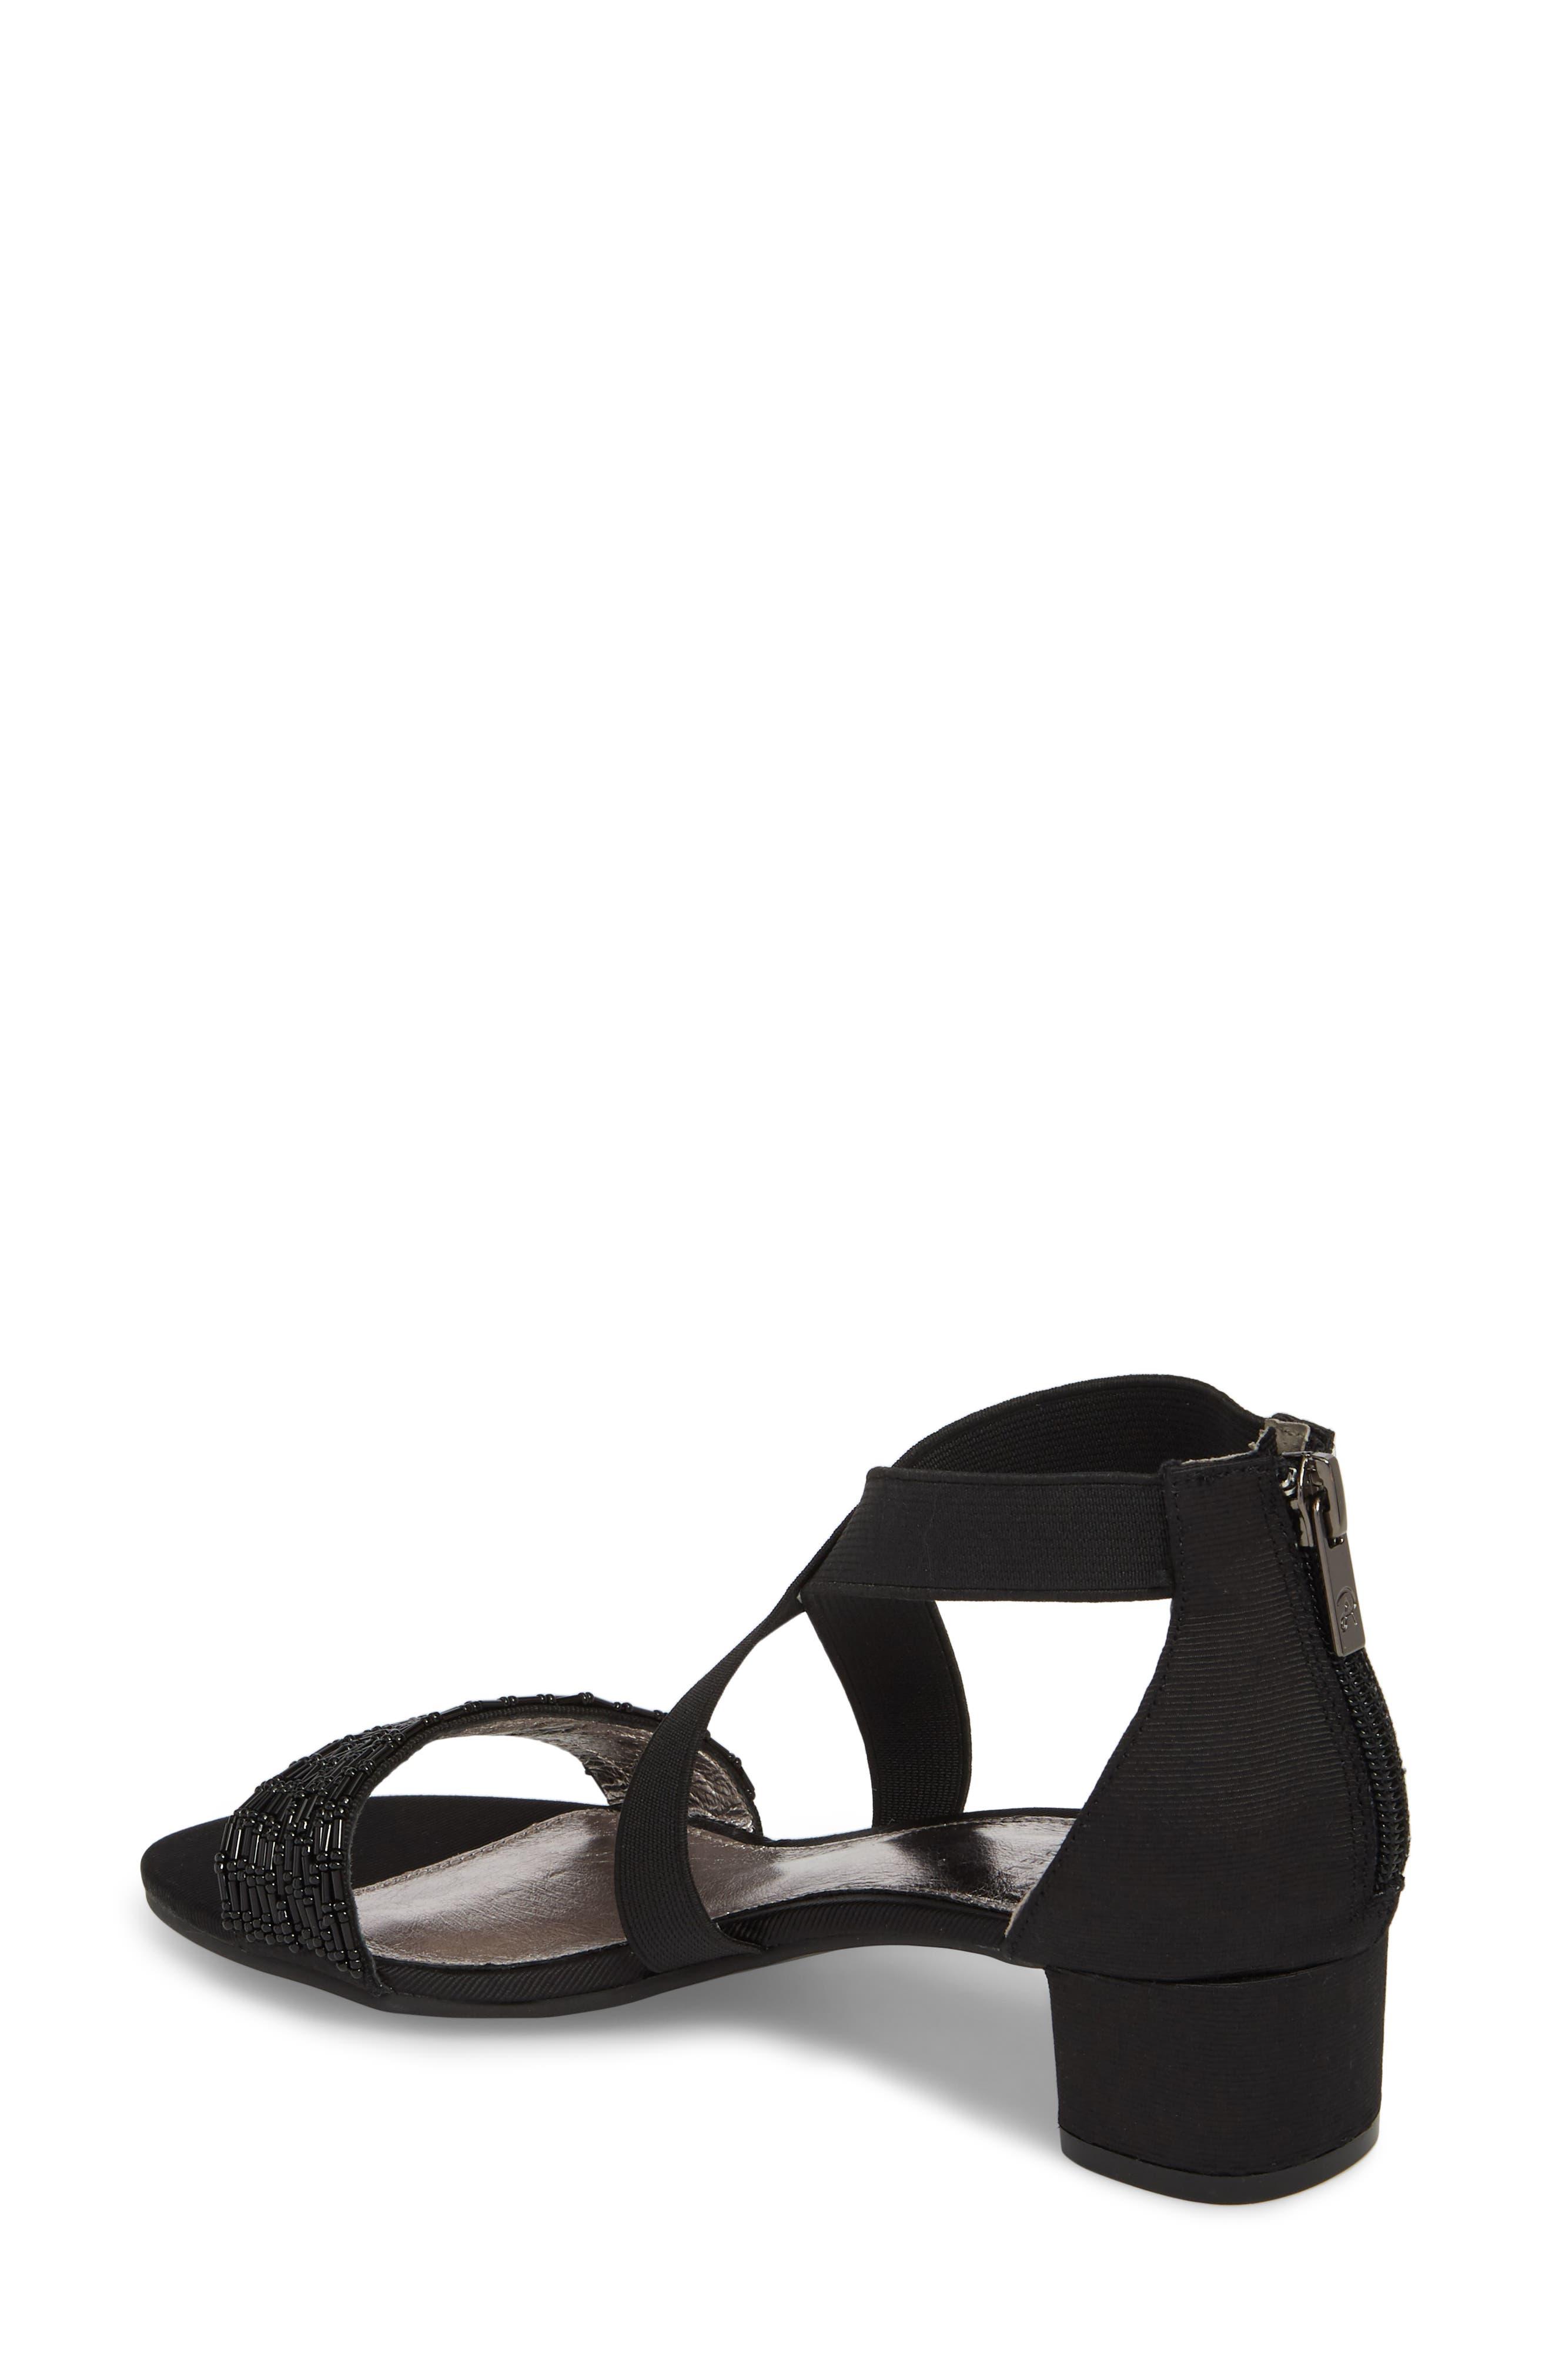 Teagen Block Heel Sandal,                             Alternate thumbnail 2, color,                             BLACK FABRIC